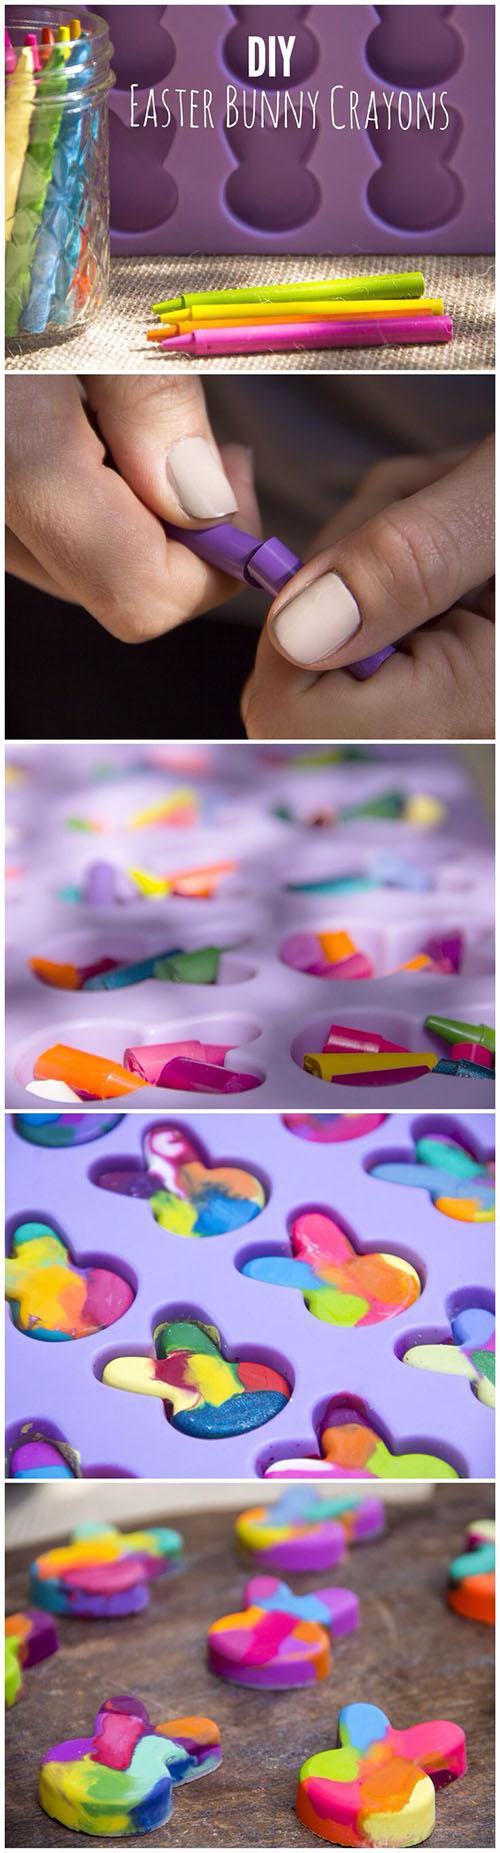 13 DIY Easter Bunny Crayons b1b47f